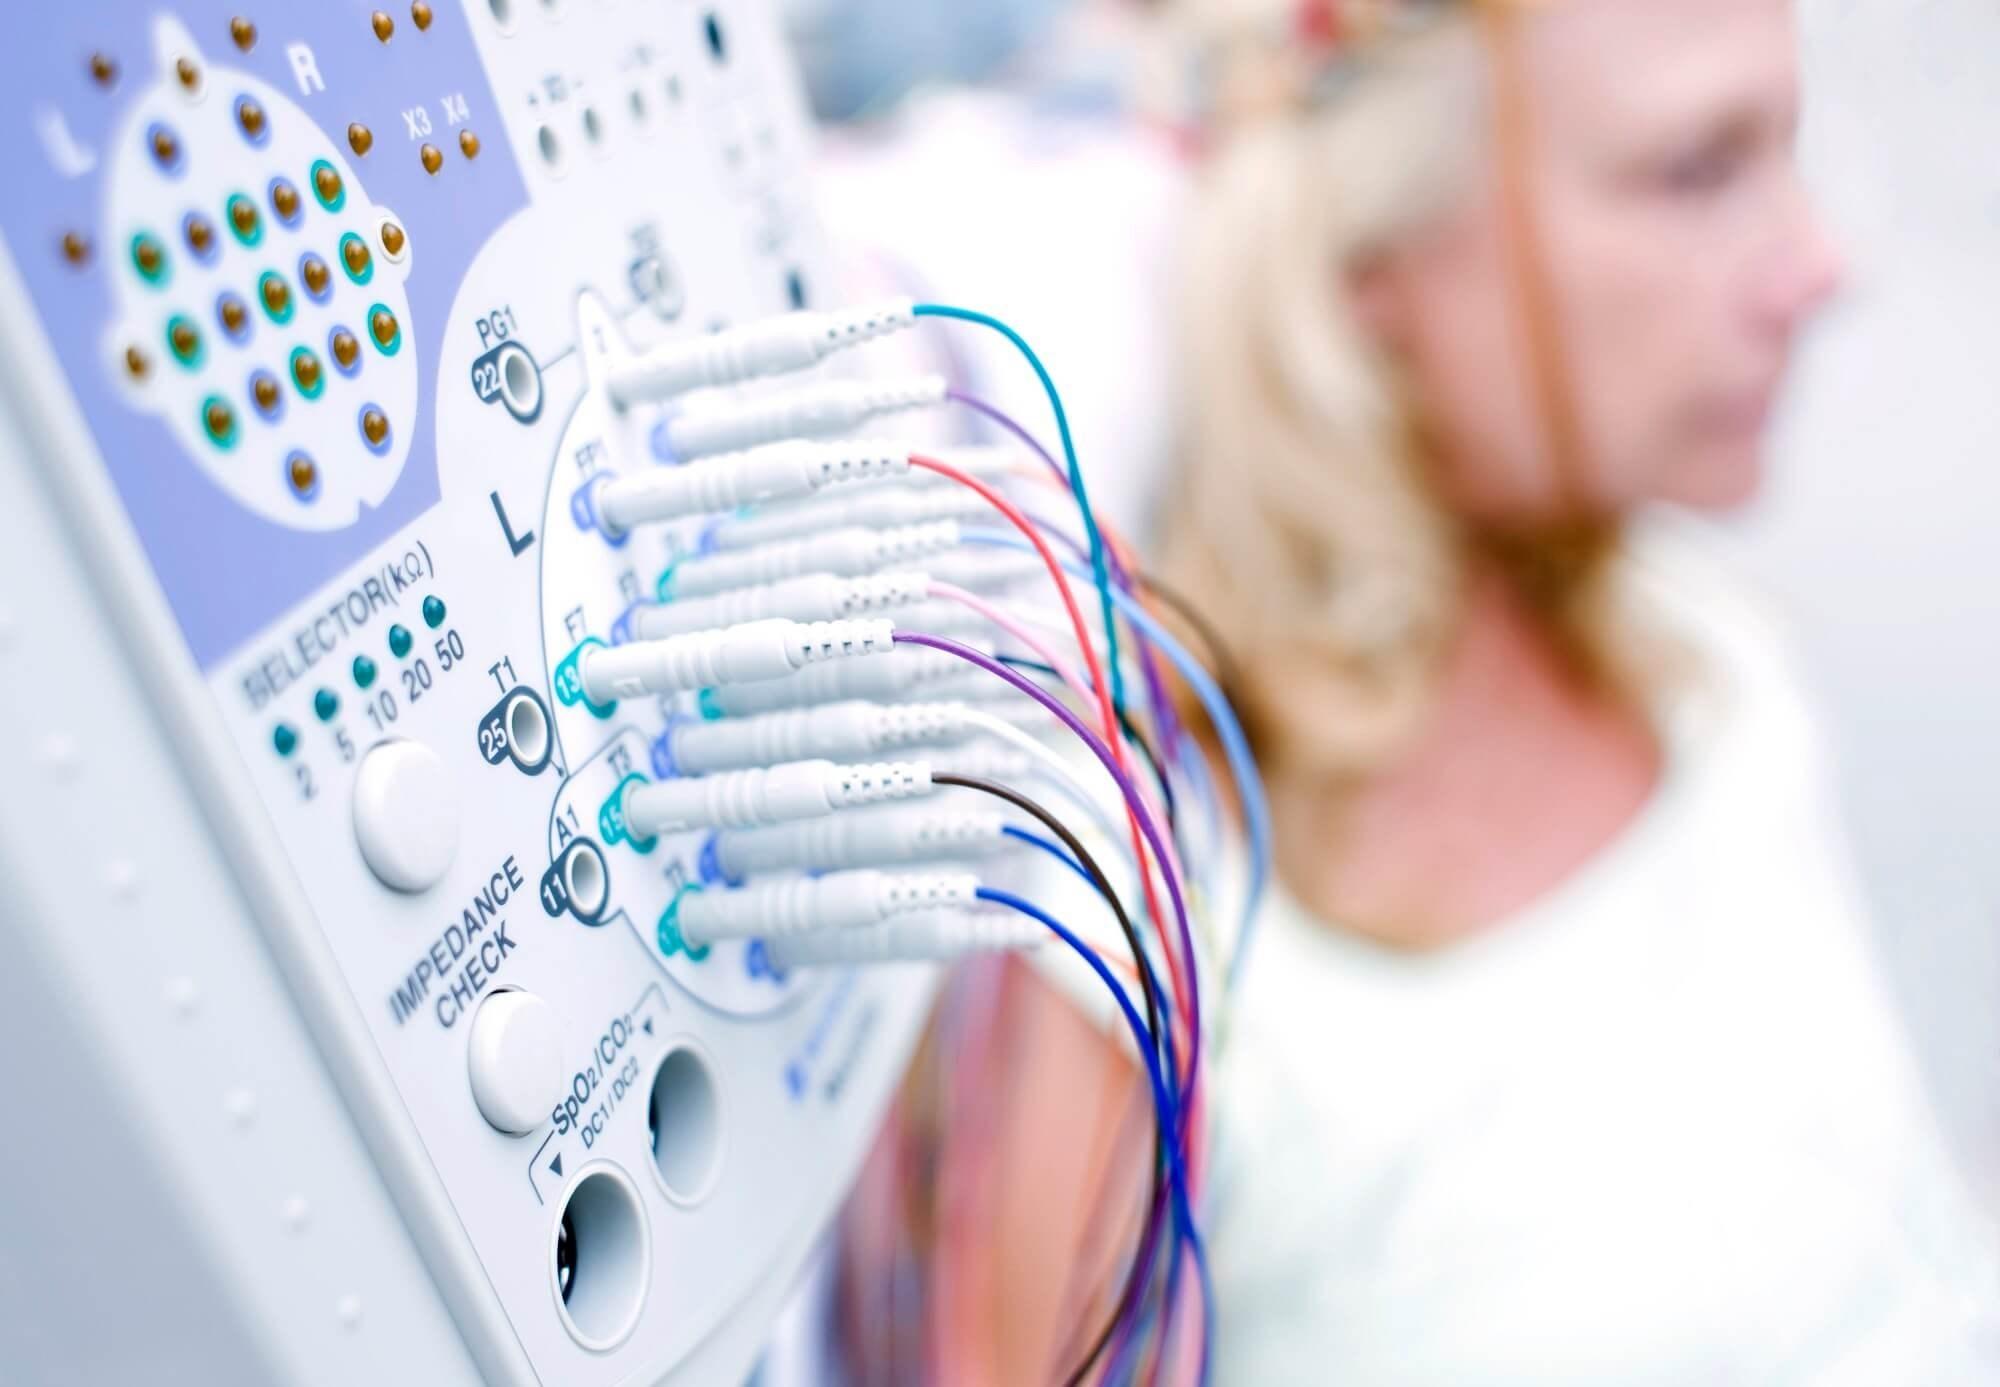 Quantitative EEG Offers Effective Detection of Parkinson Disease Biomarkers